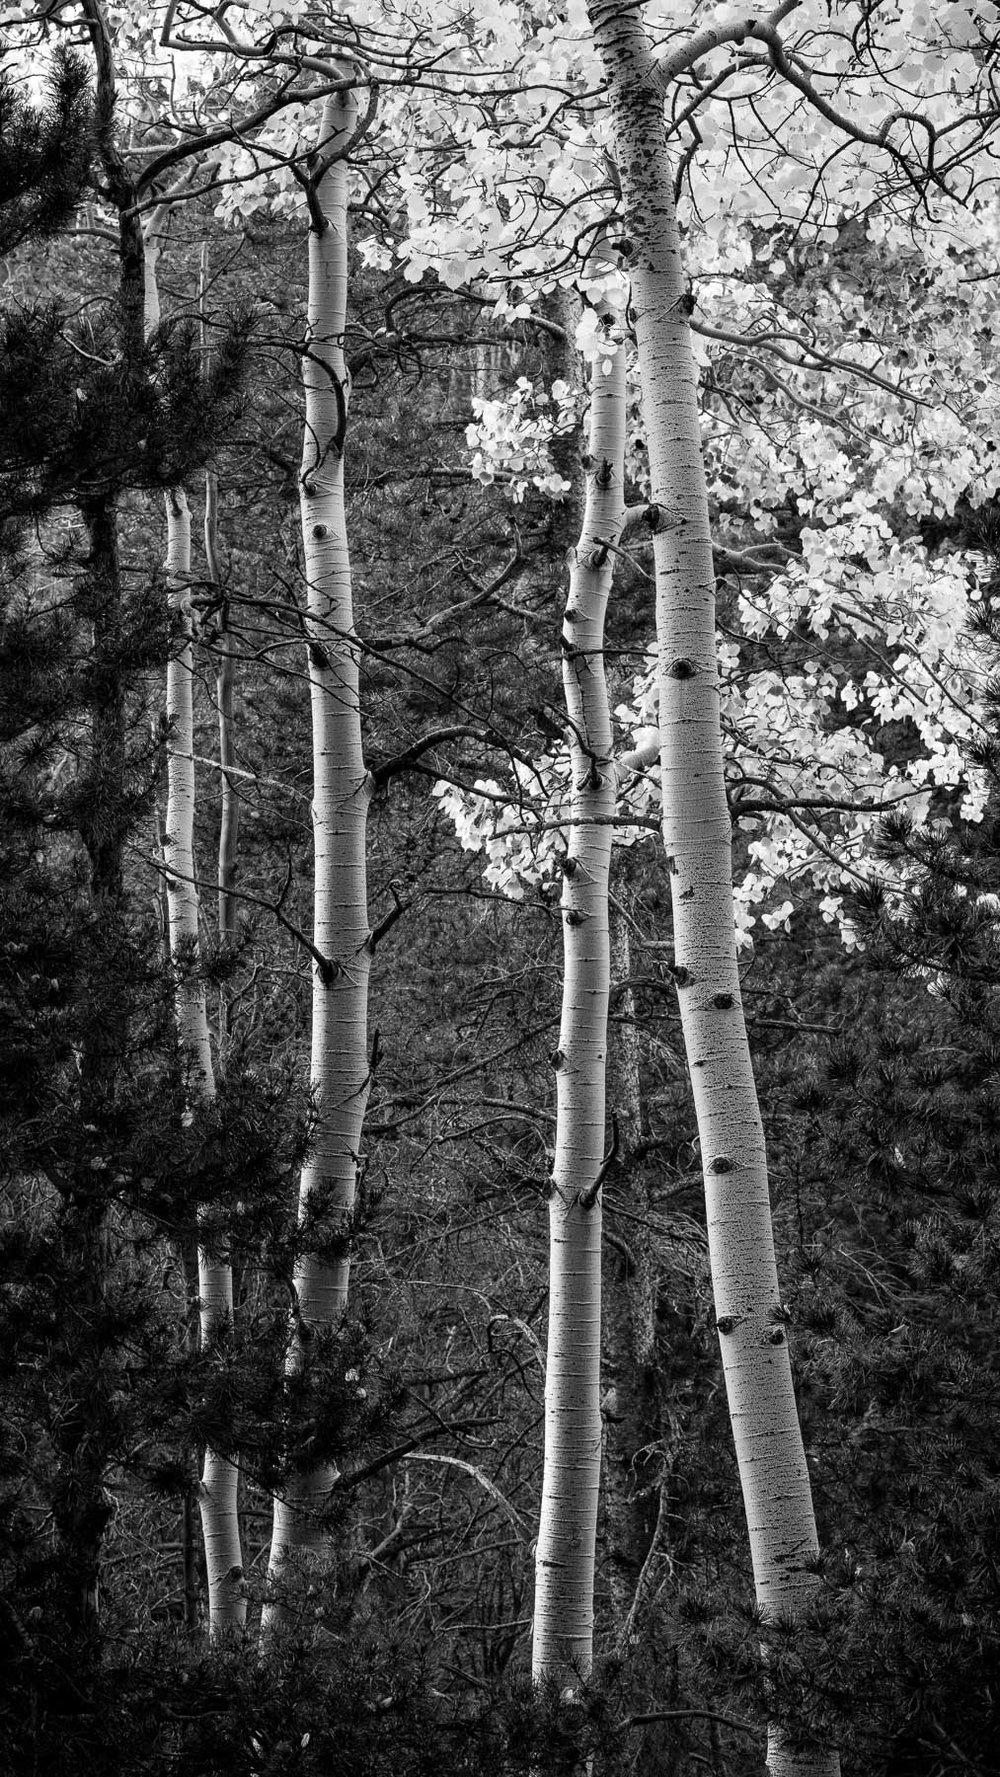 Mauzy-Tree-15.jpg